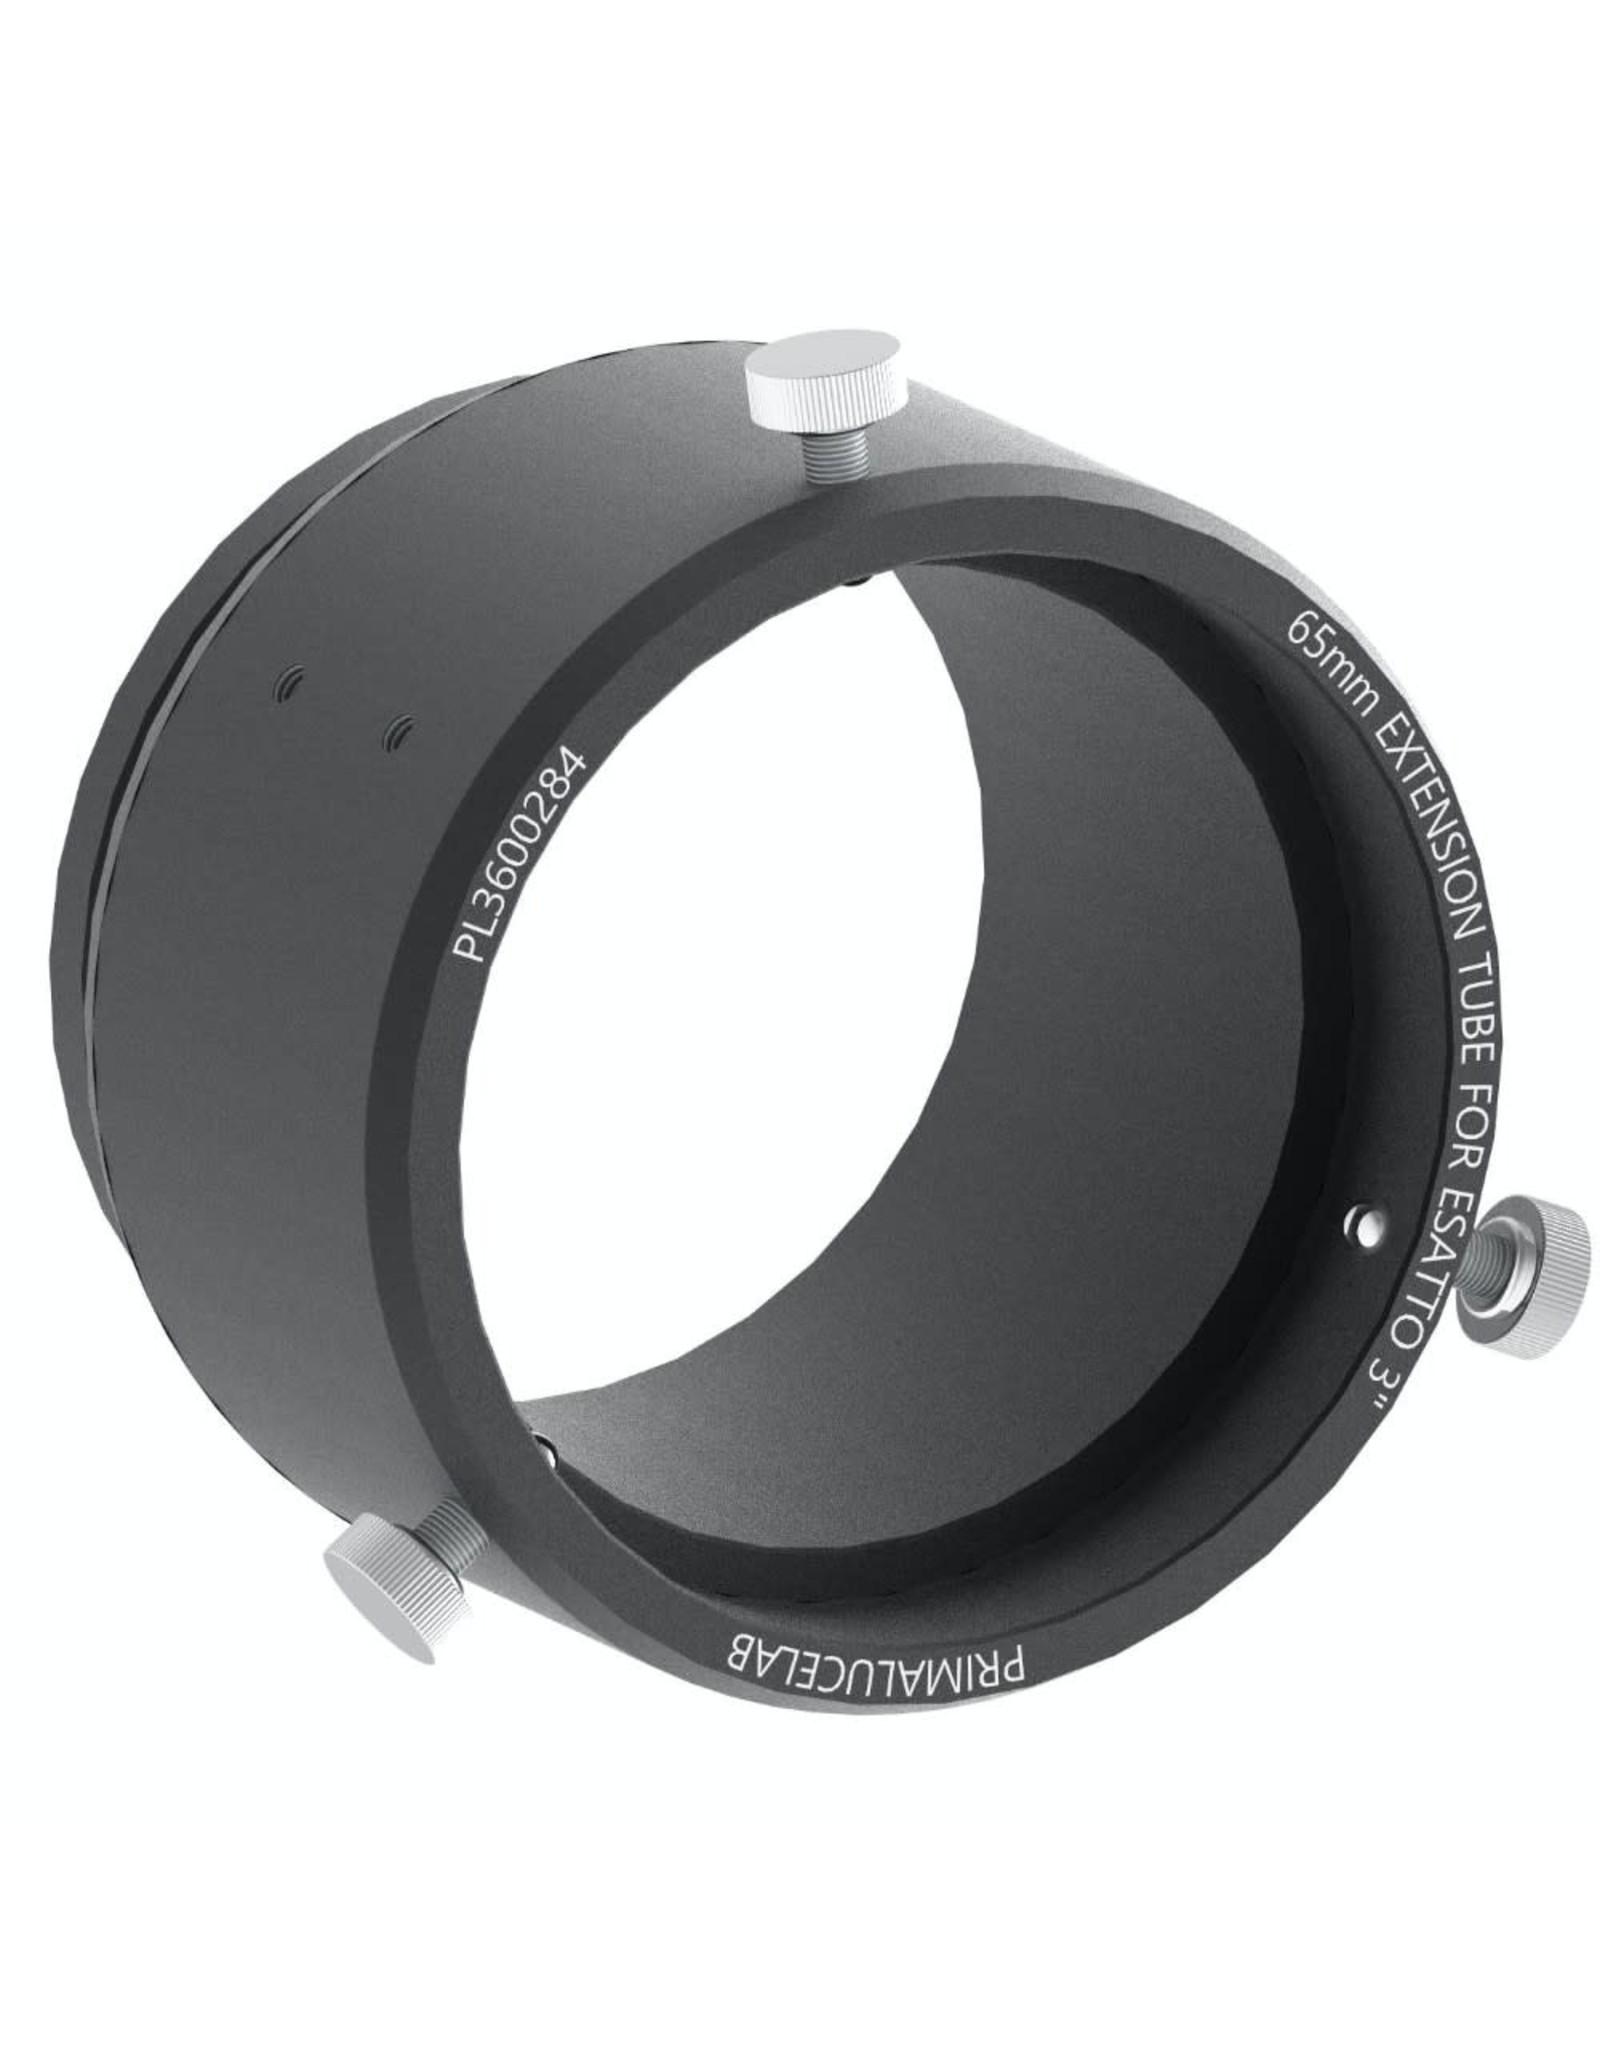 "PrimaLuceLab Primaluce 65mm Extension Tube for ESATTO 3"" - PL3600284"